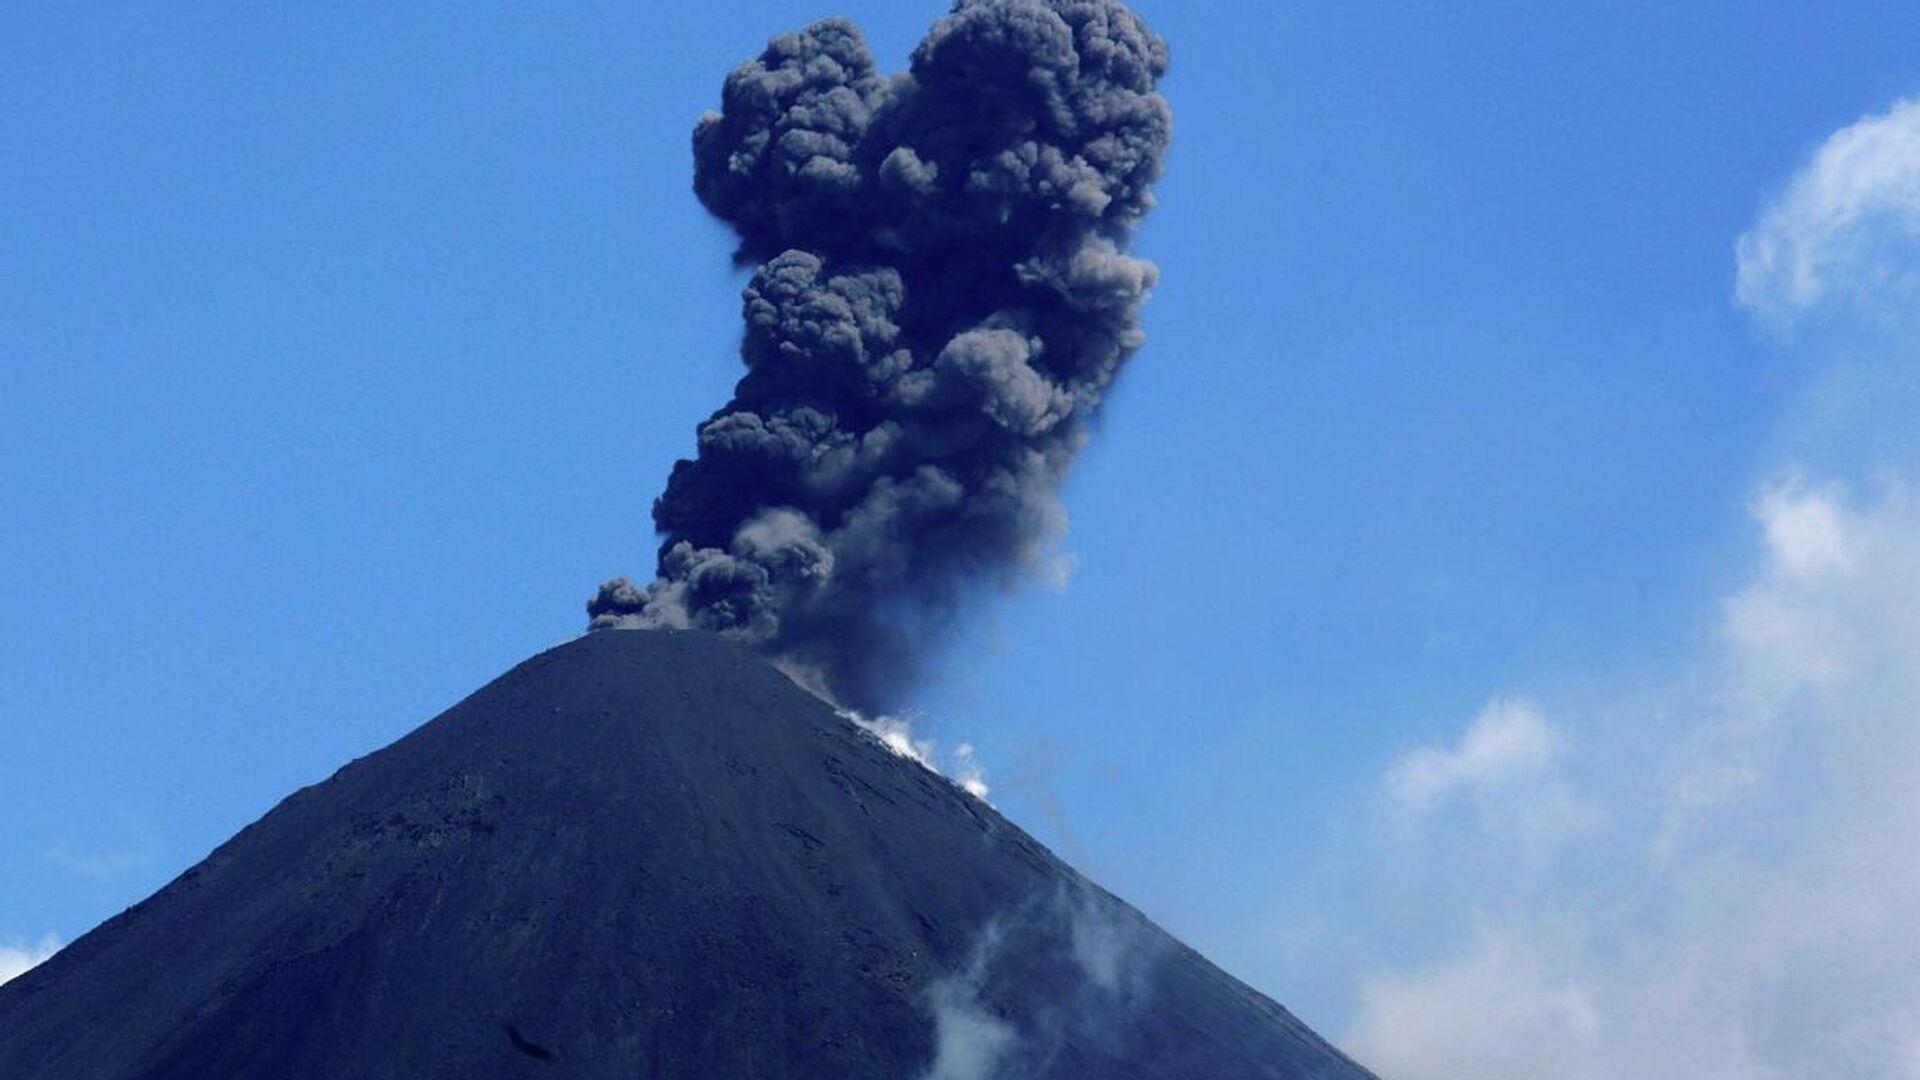 El volcán Pacaya de Guatemala - Sputnik Mundo, 1920, 05.03.2021